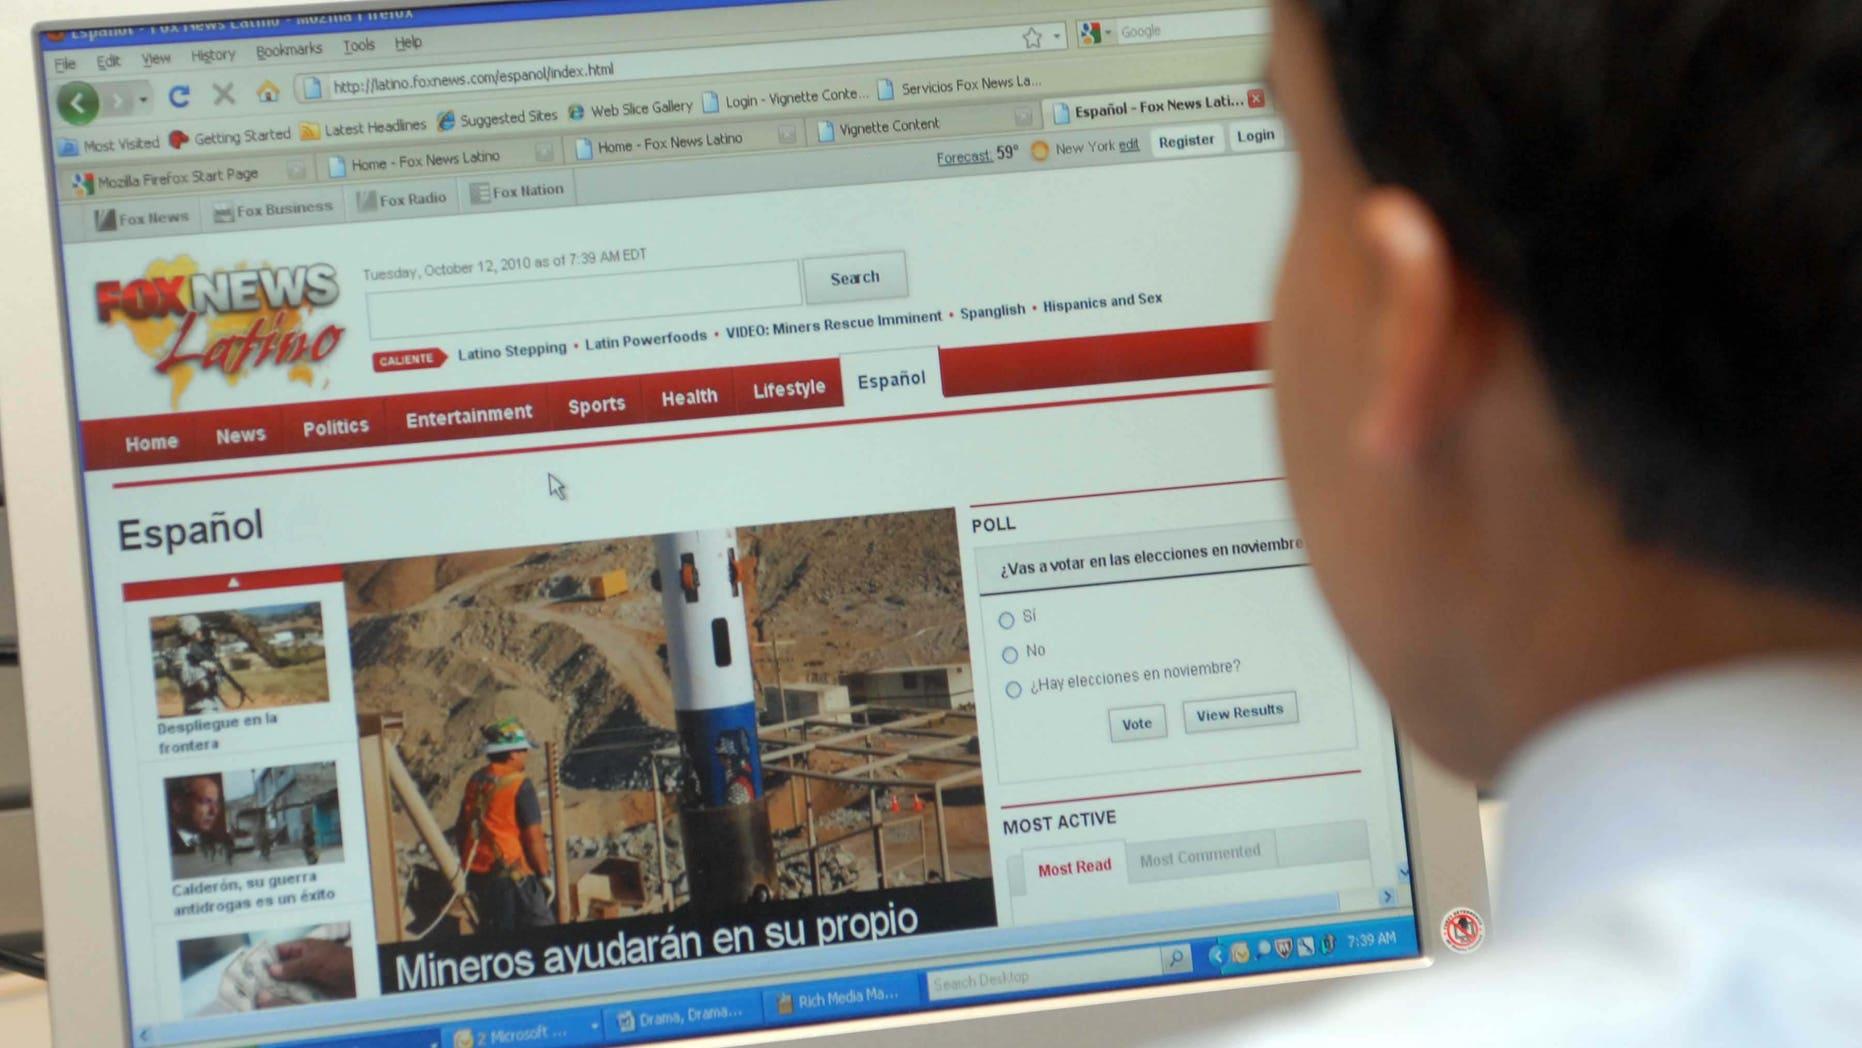 Spanish Third Most-Read Language on the Internet | Fox News